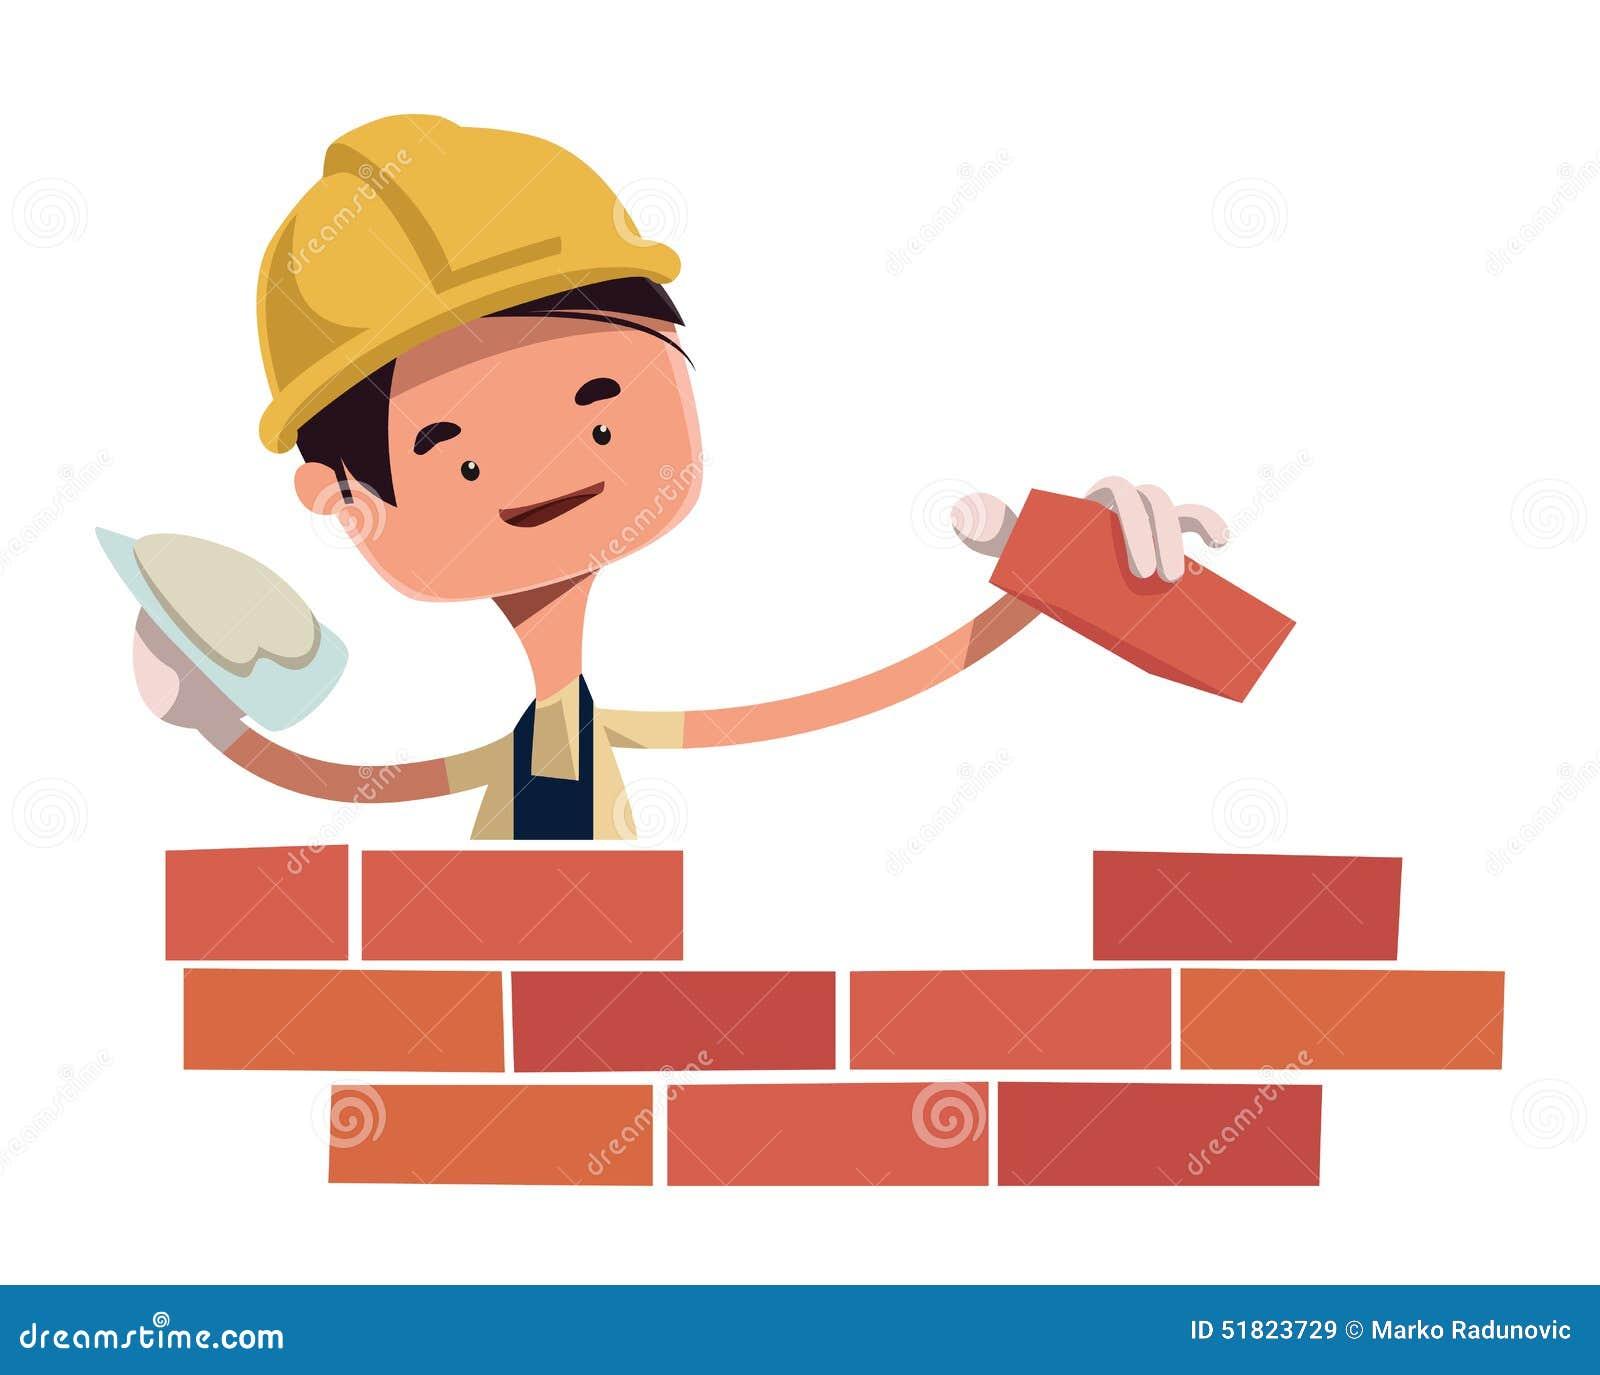 Building Construction Cartoon : Construction worker building wall illustration cartoon